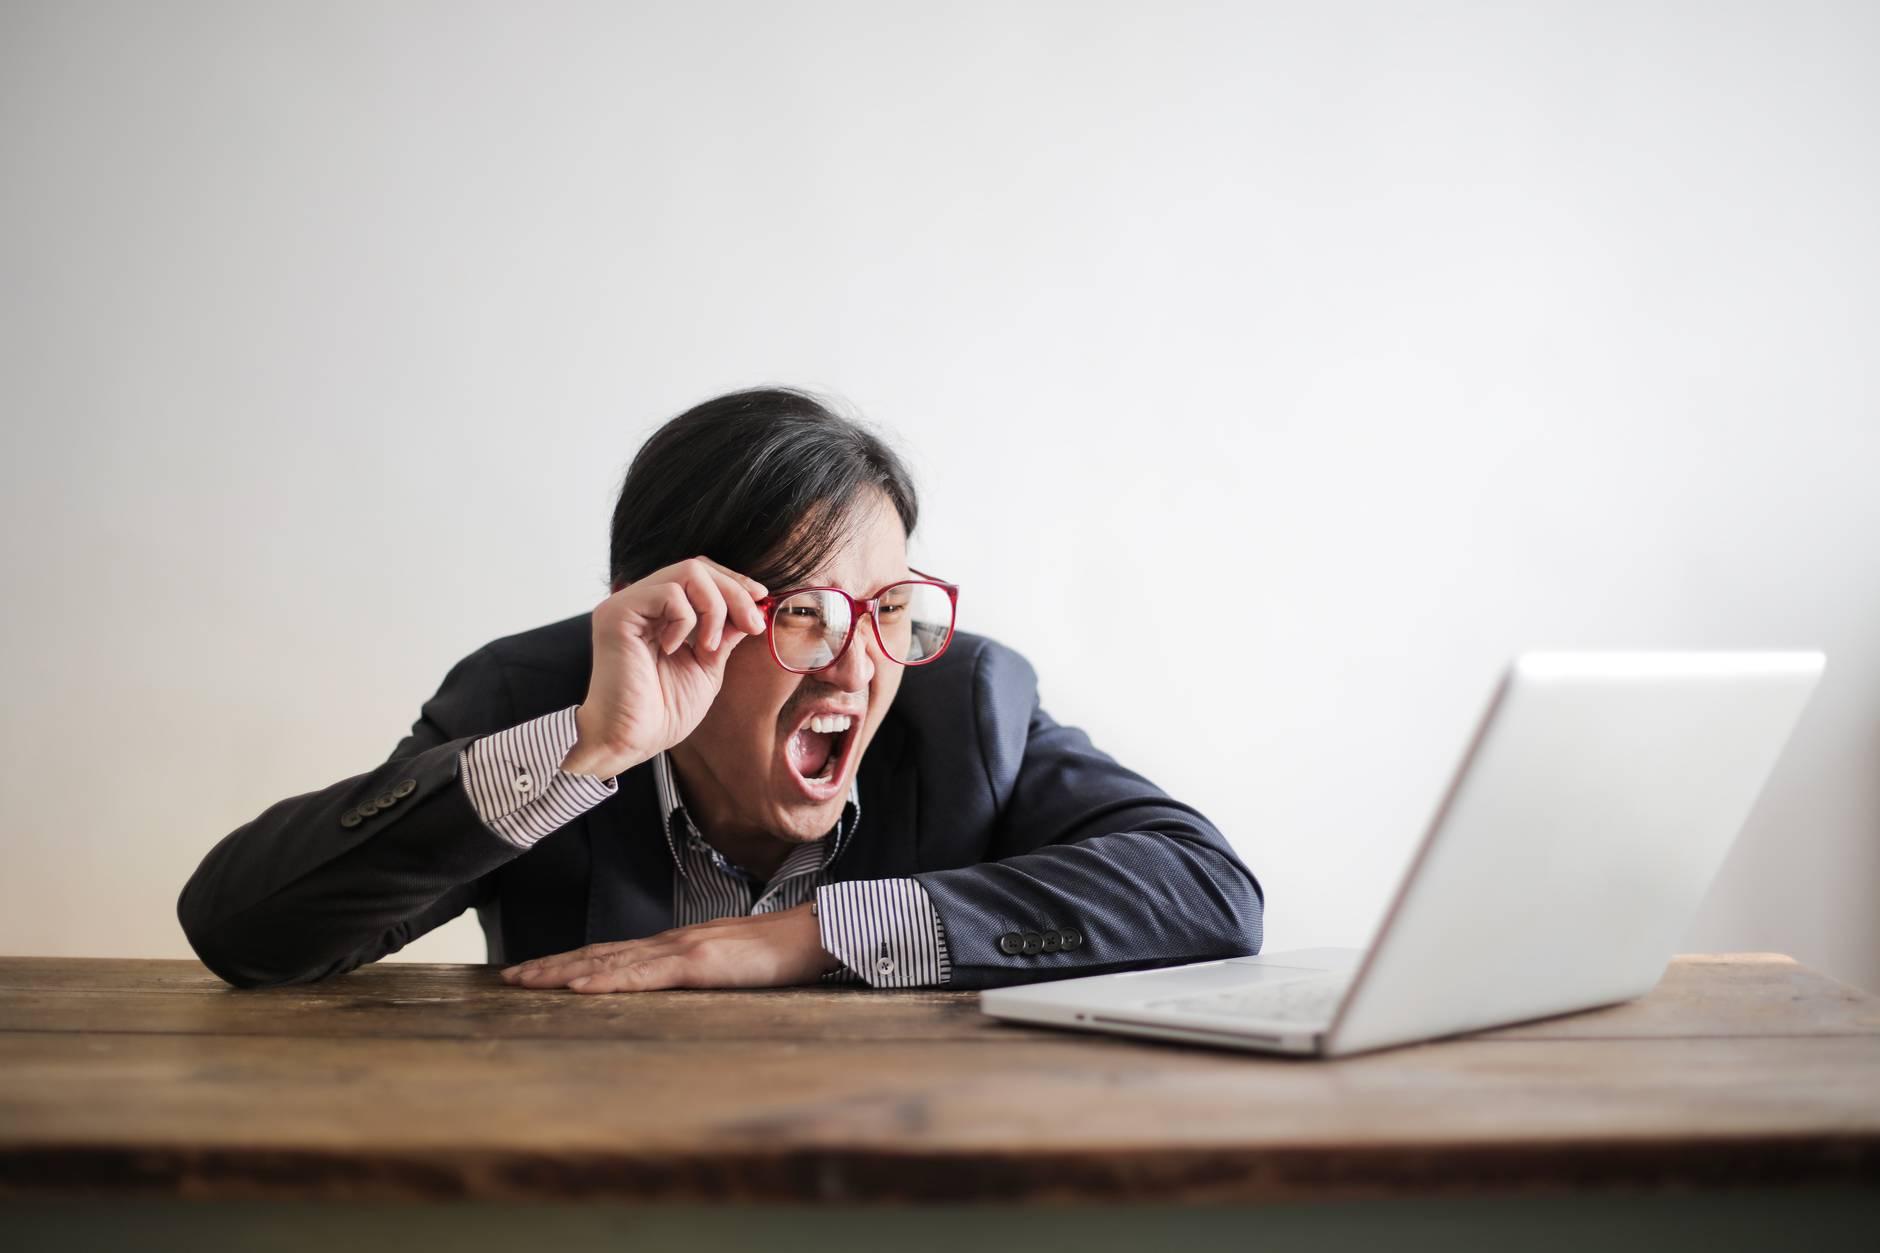 workaholism, shocked, surprised, working hard, laptop